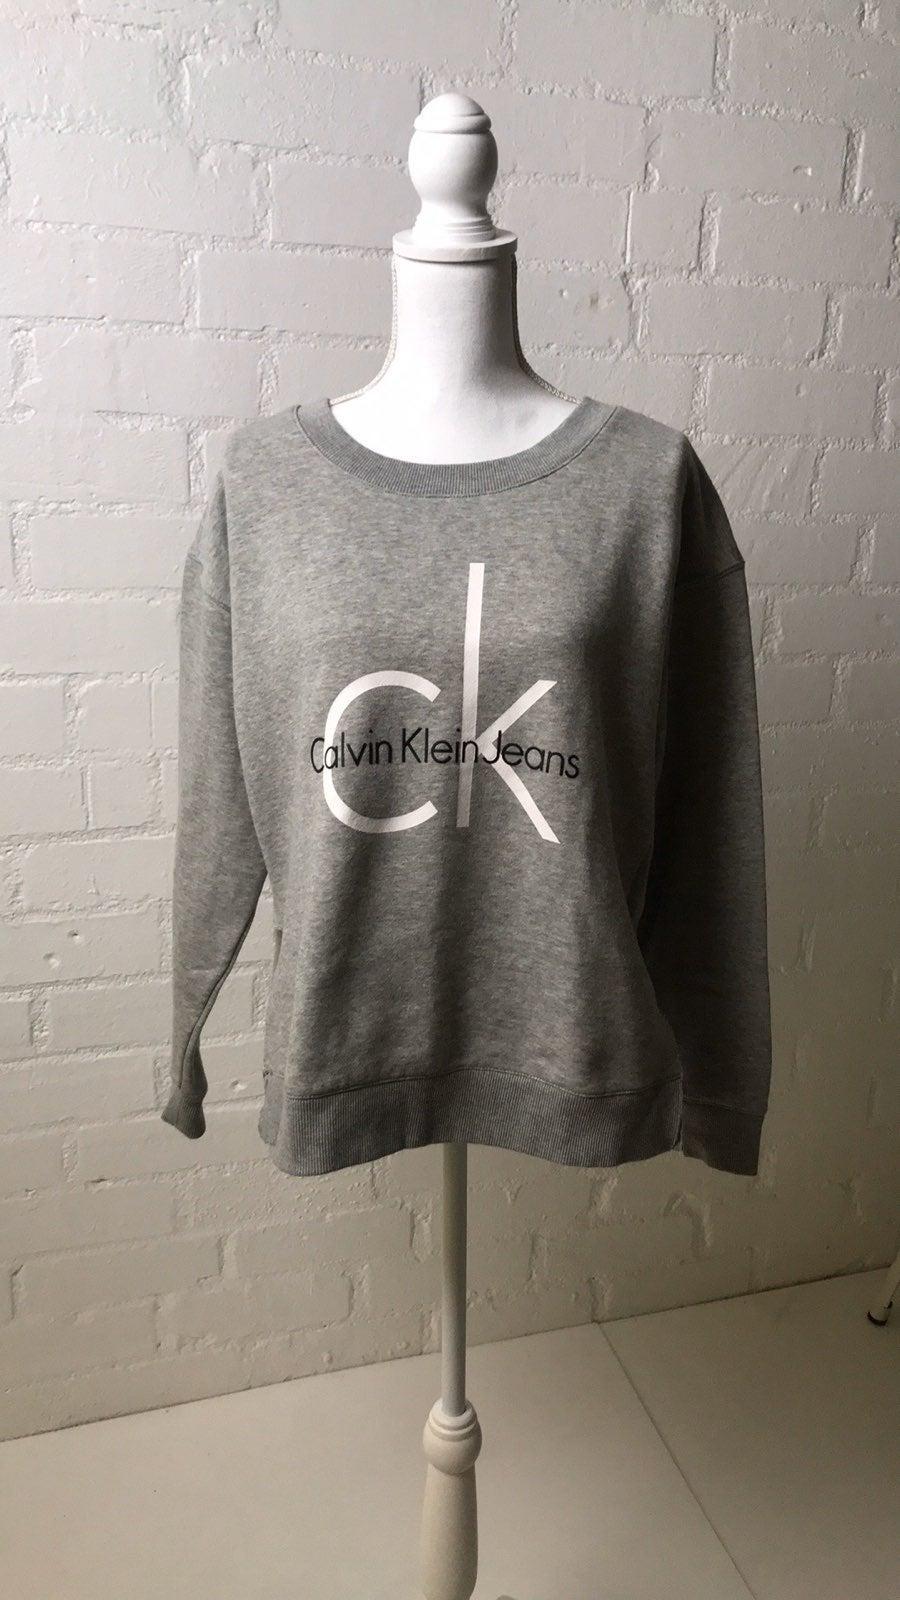 Classic CK jeans cut side sweatshirt L